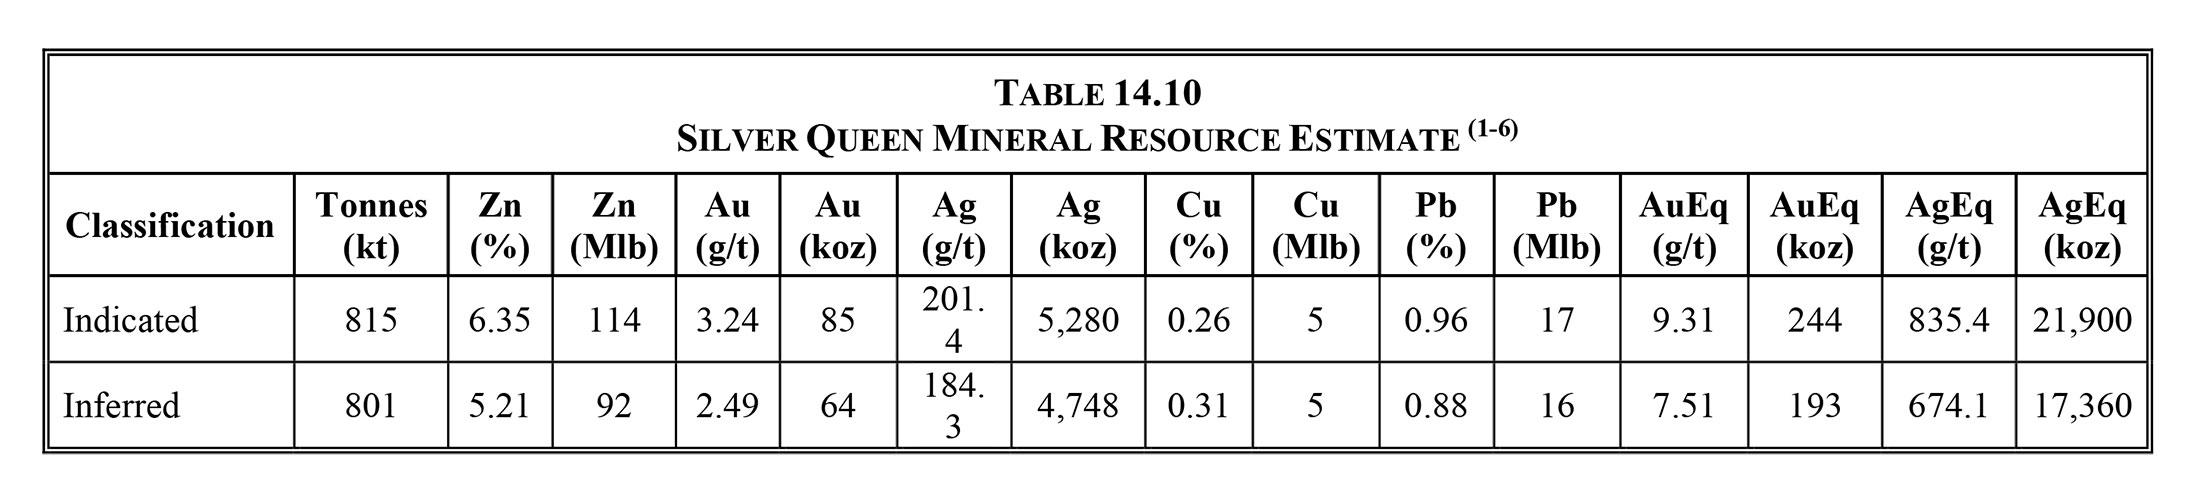 Silver Queen Mineral Resource Estimate